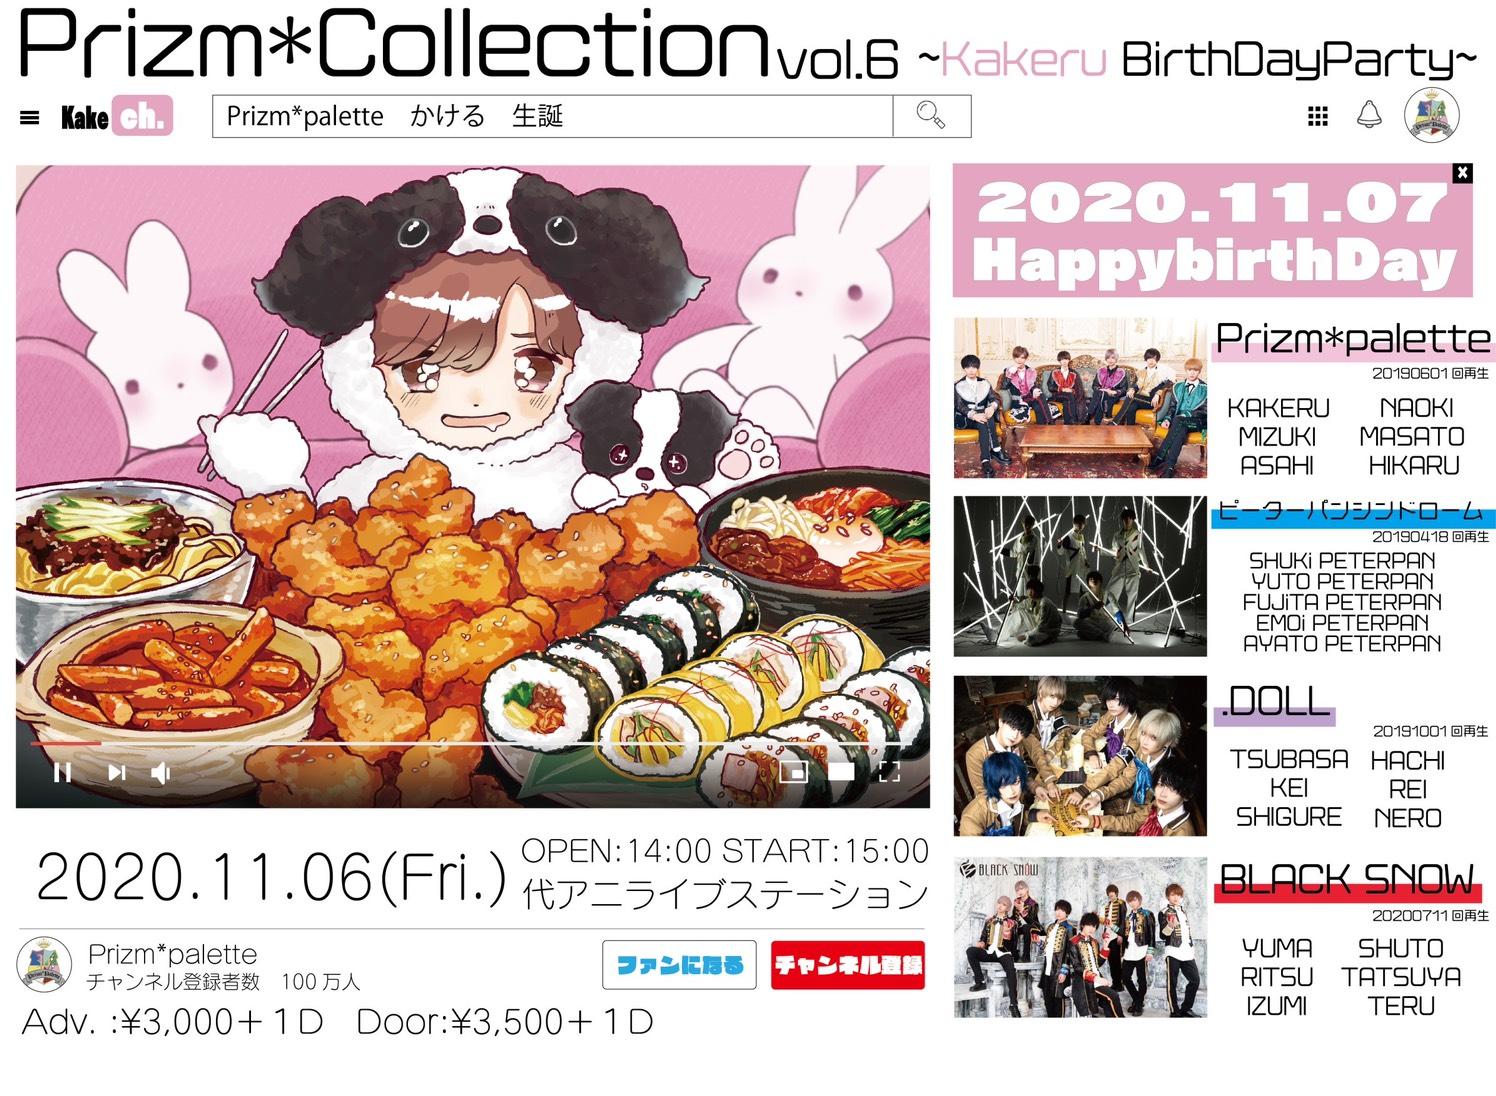 Prizm*Collection vol.6~Kakeru BirthdayParty~